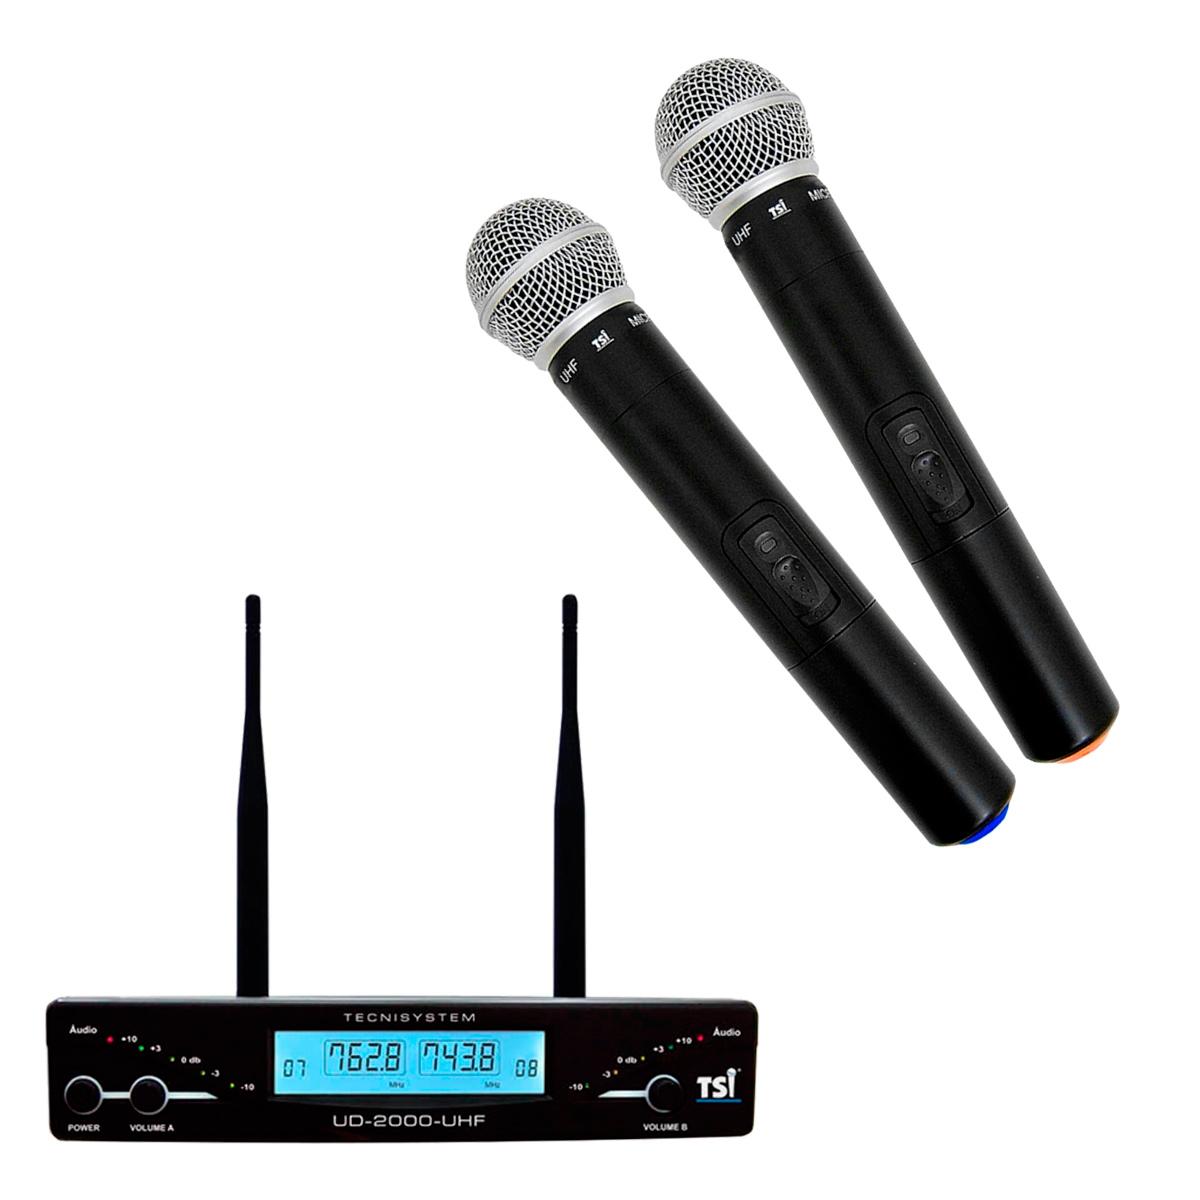 UD2000 - Microfone s/ Fio de Mão Duplo UHF UD 2000 - TSI